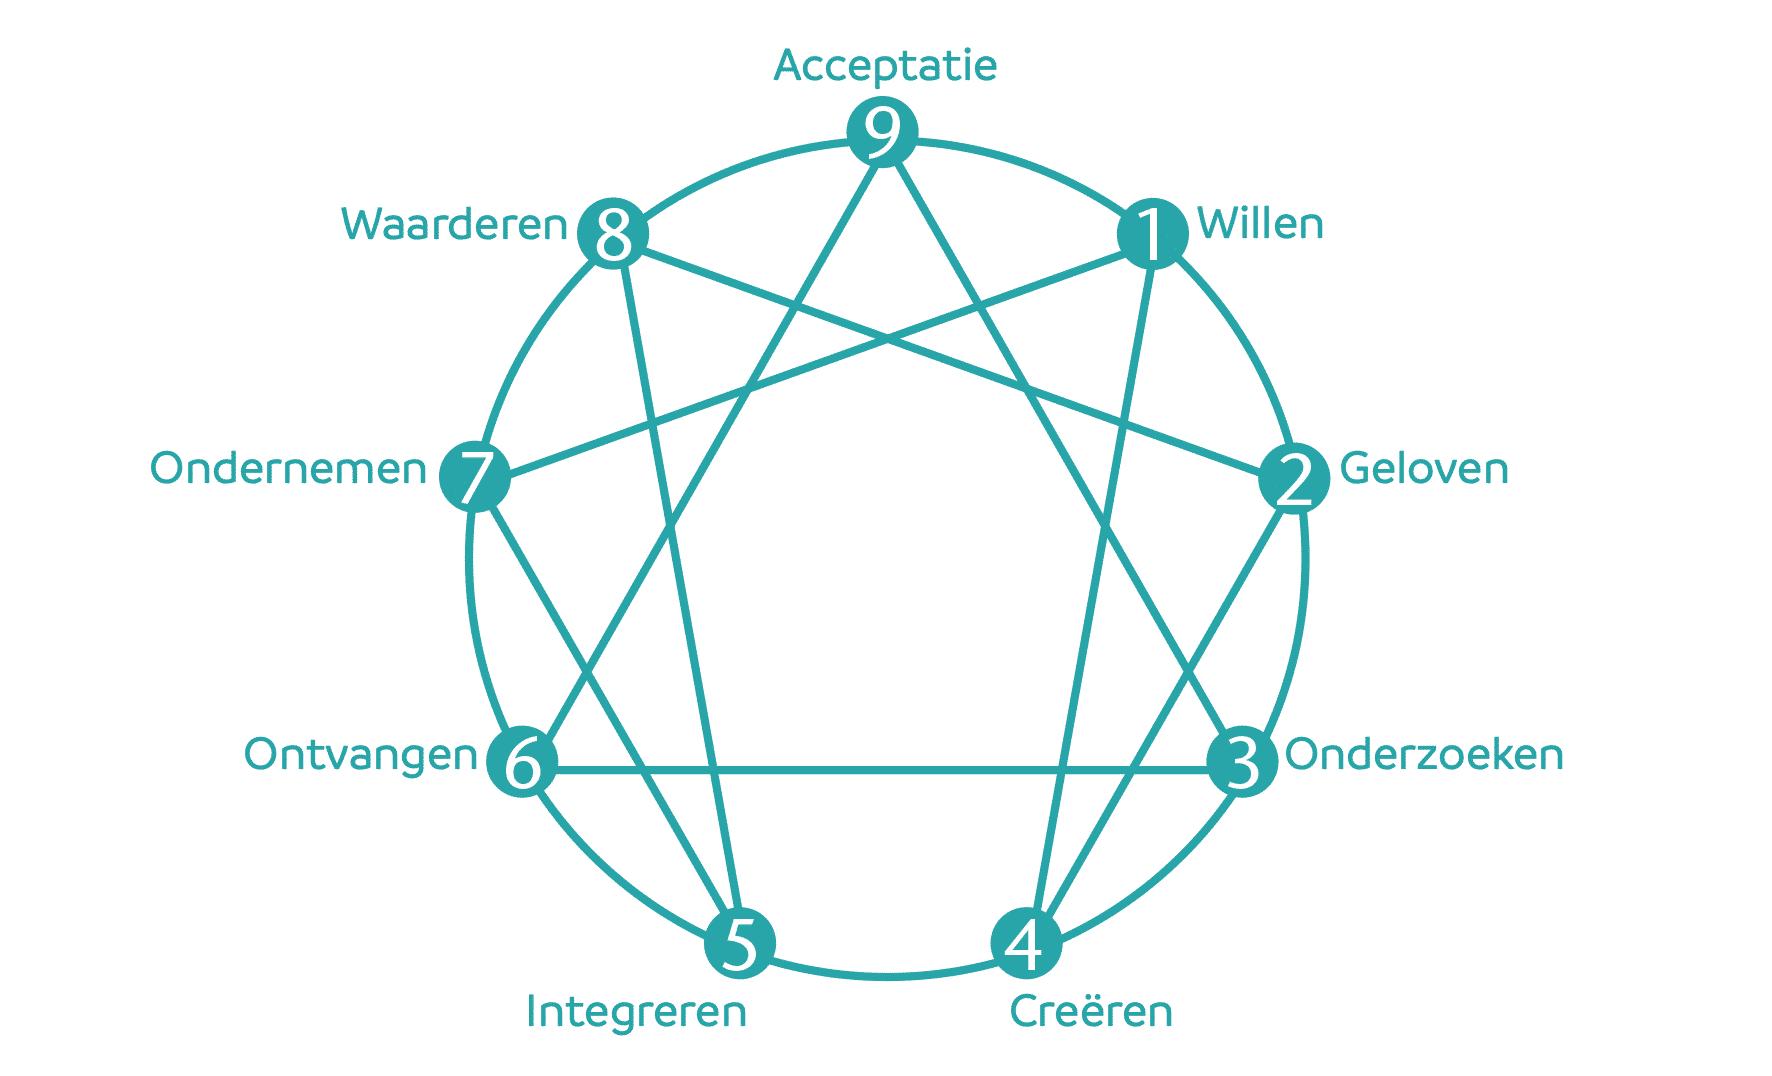 Enneagram Proces model